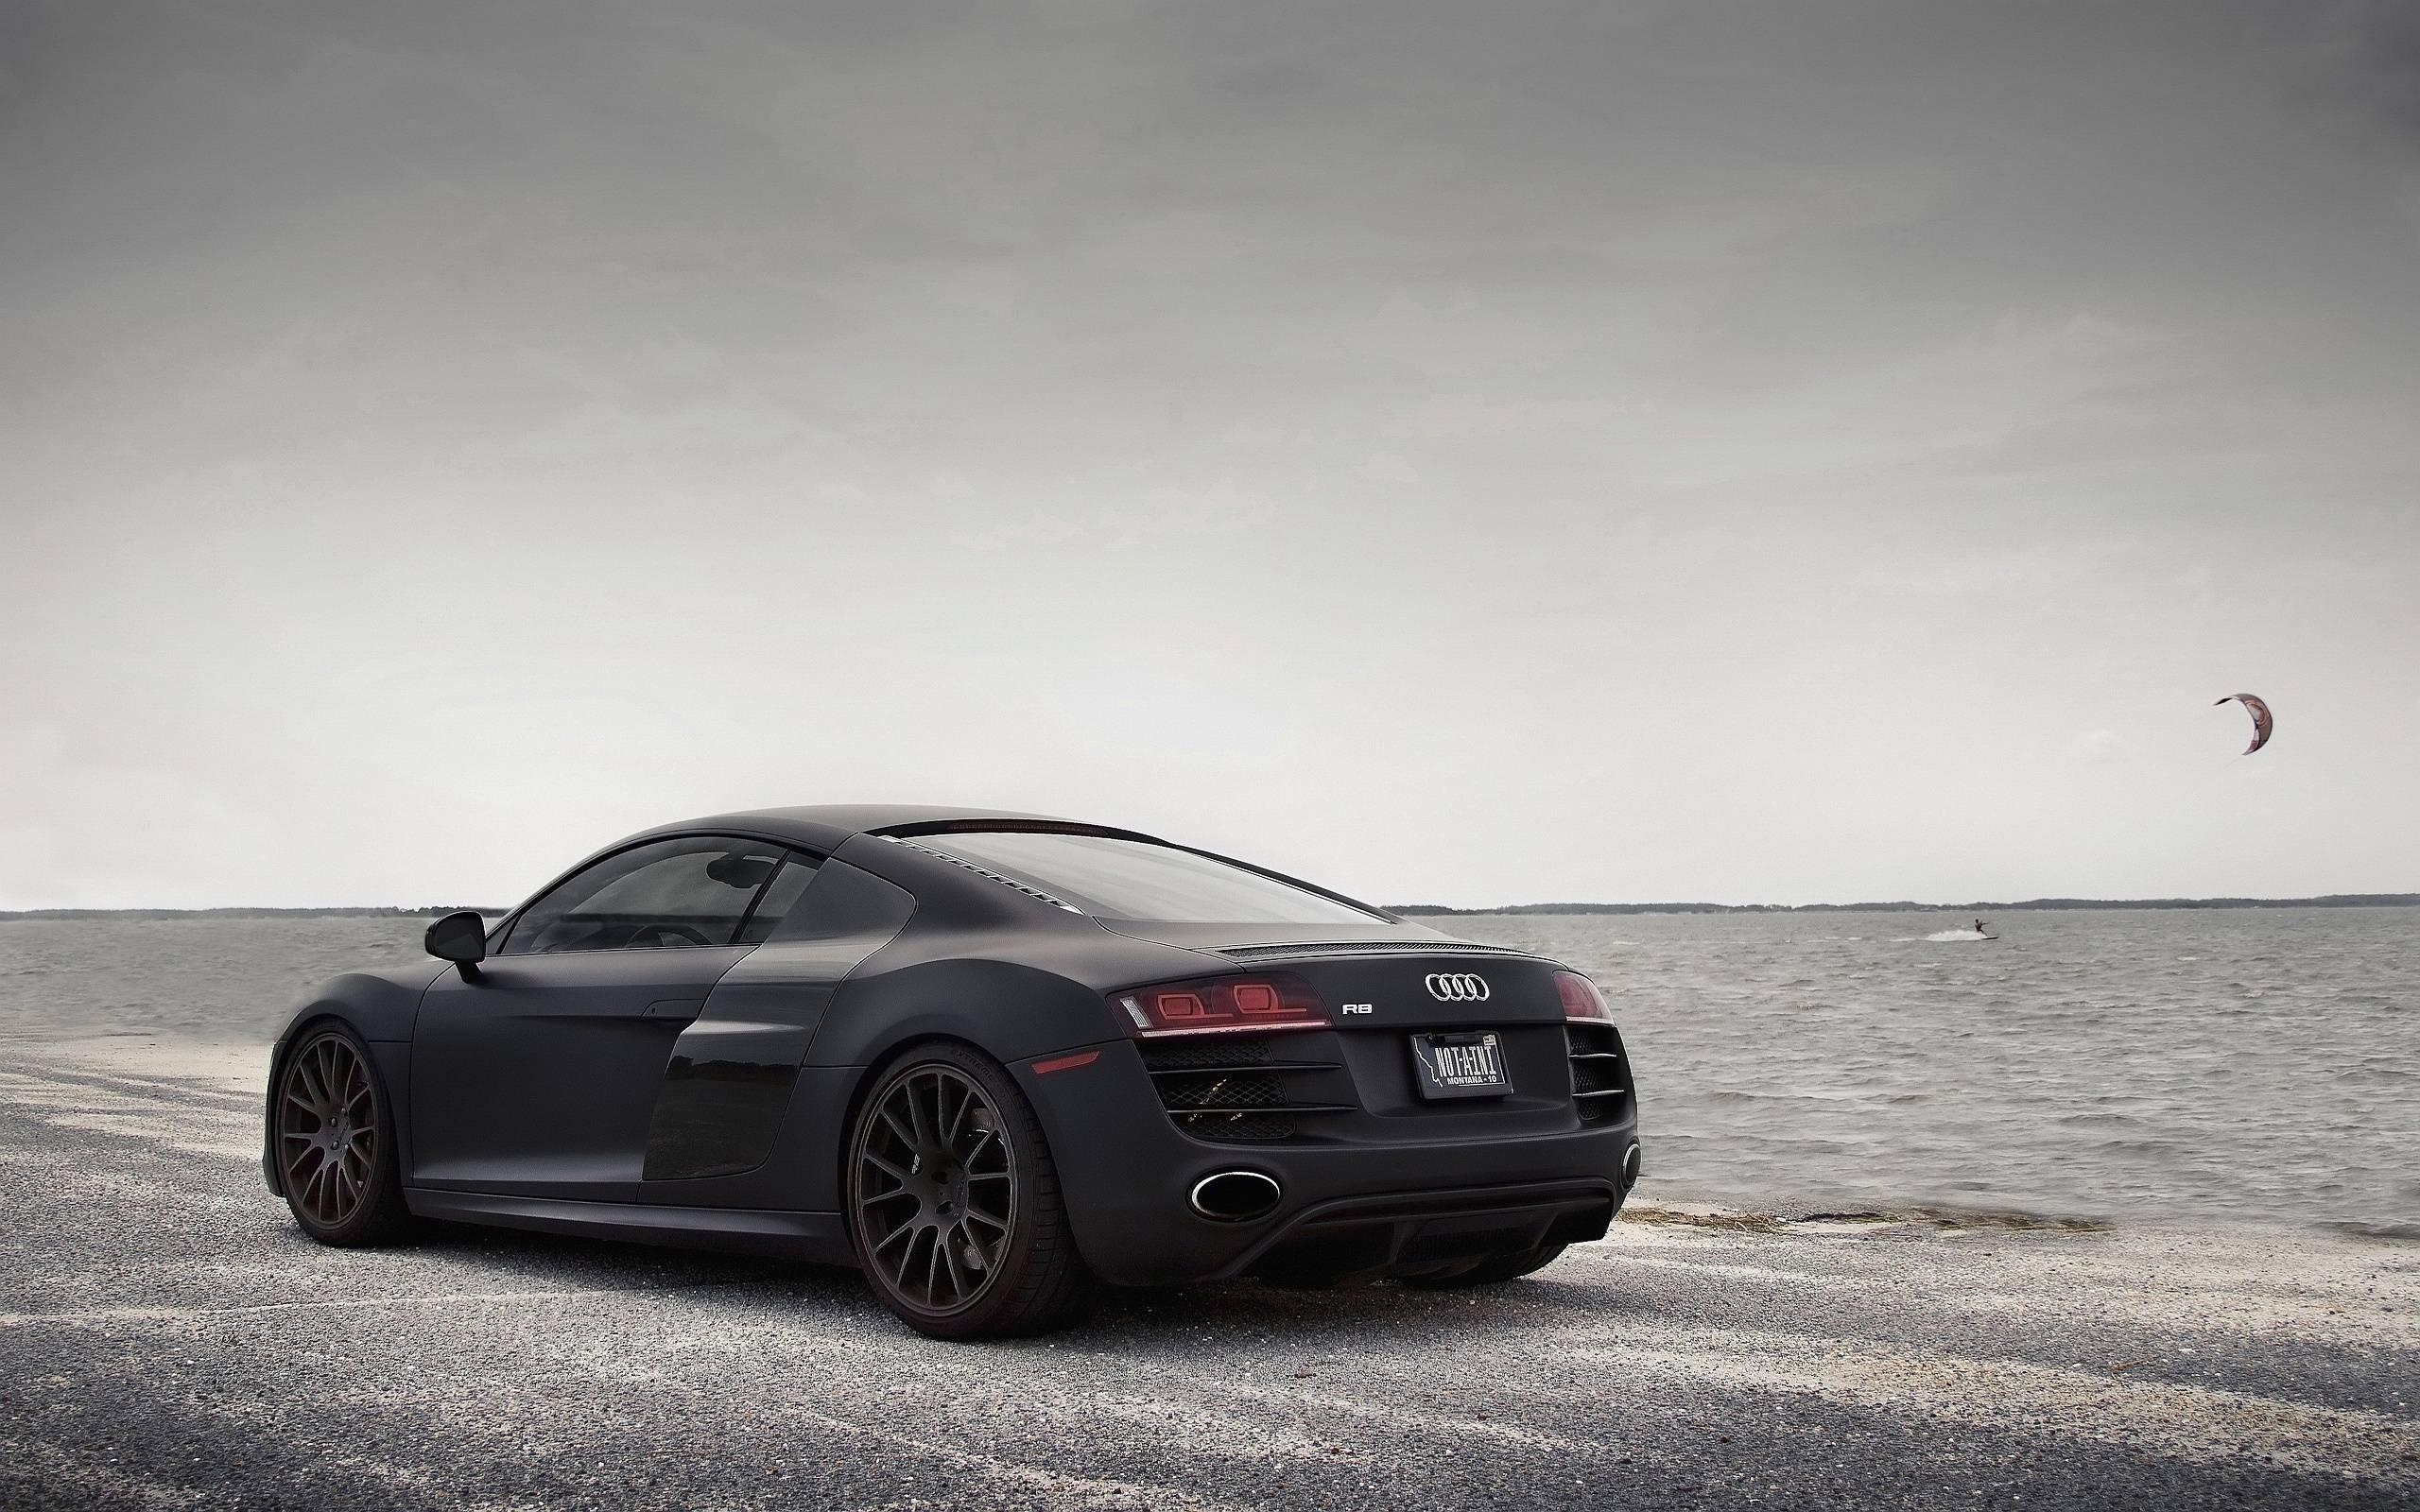 Black Audi R8 Wallpapers Top Free Black Audi R8 Backgrounds Wallpaperaccess